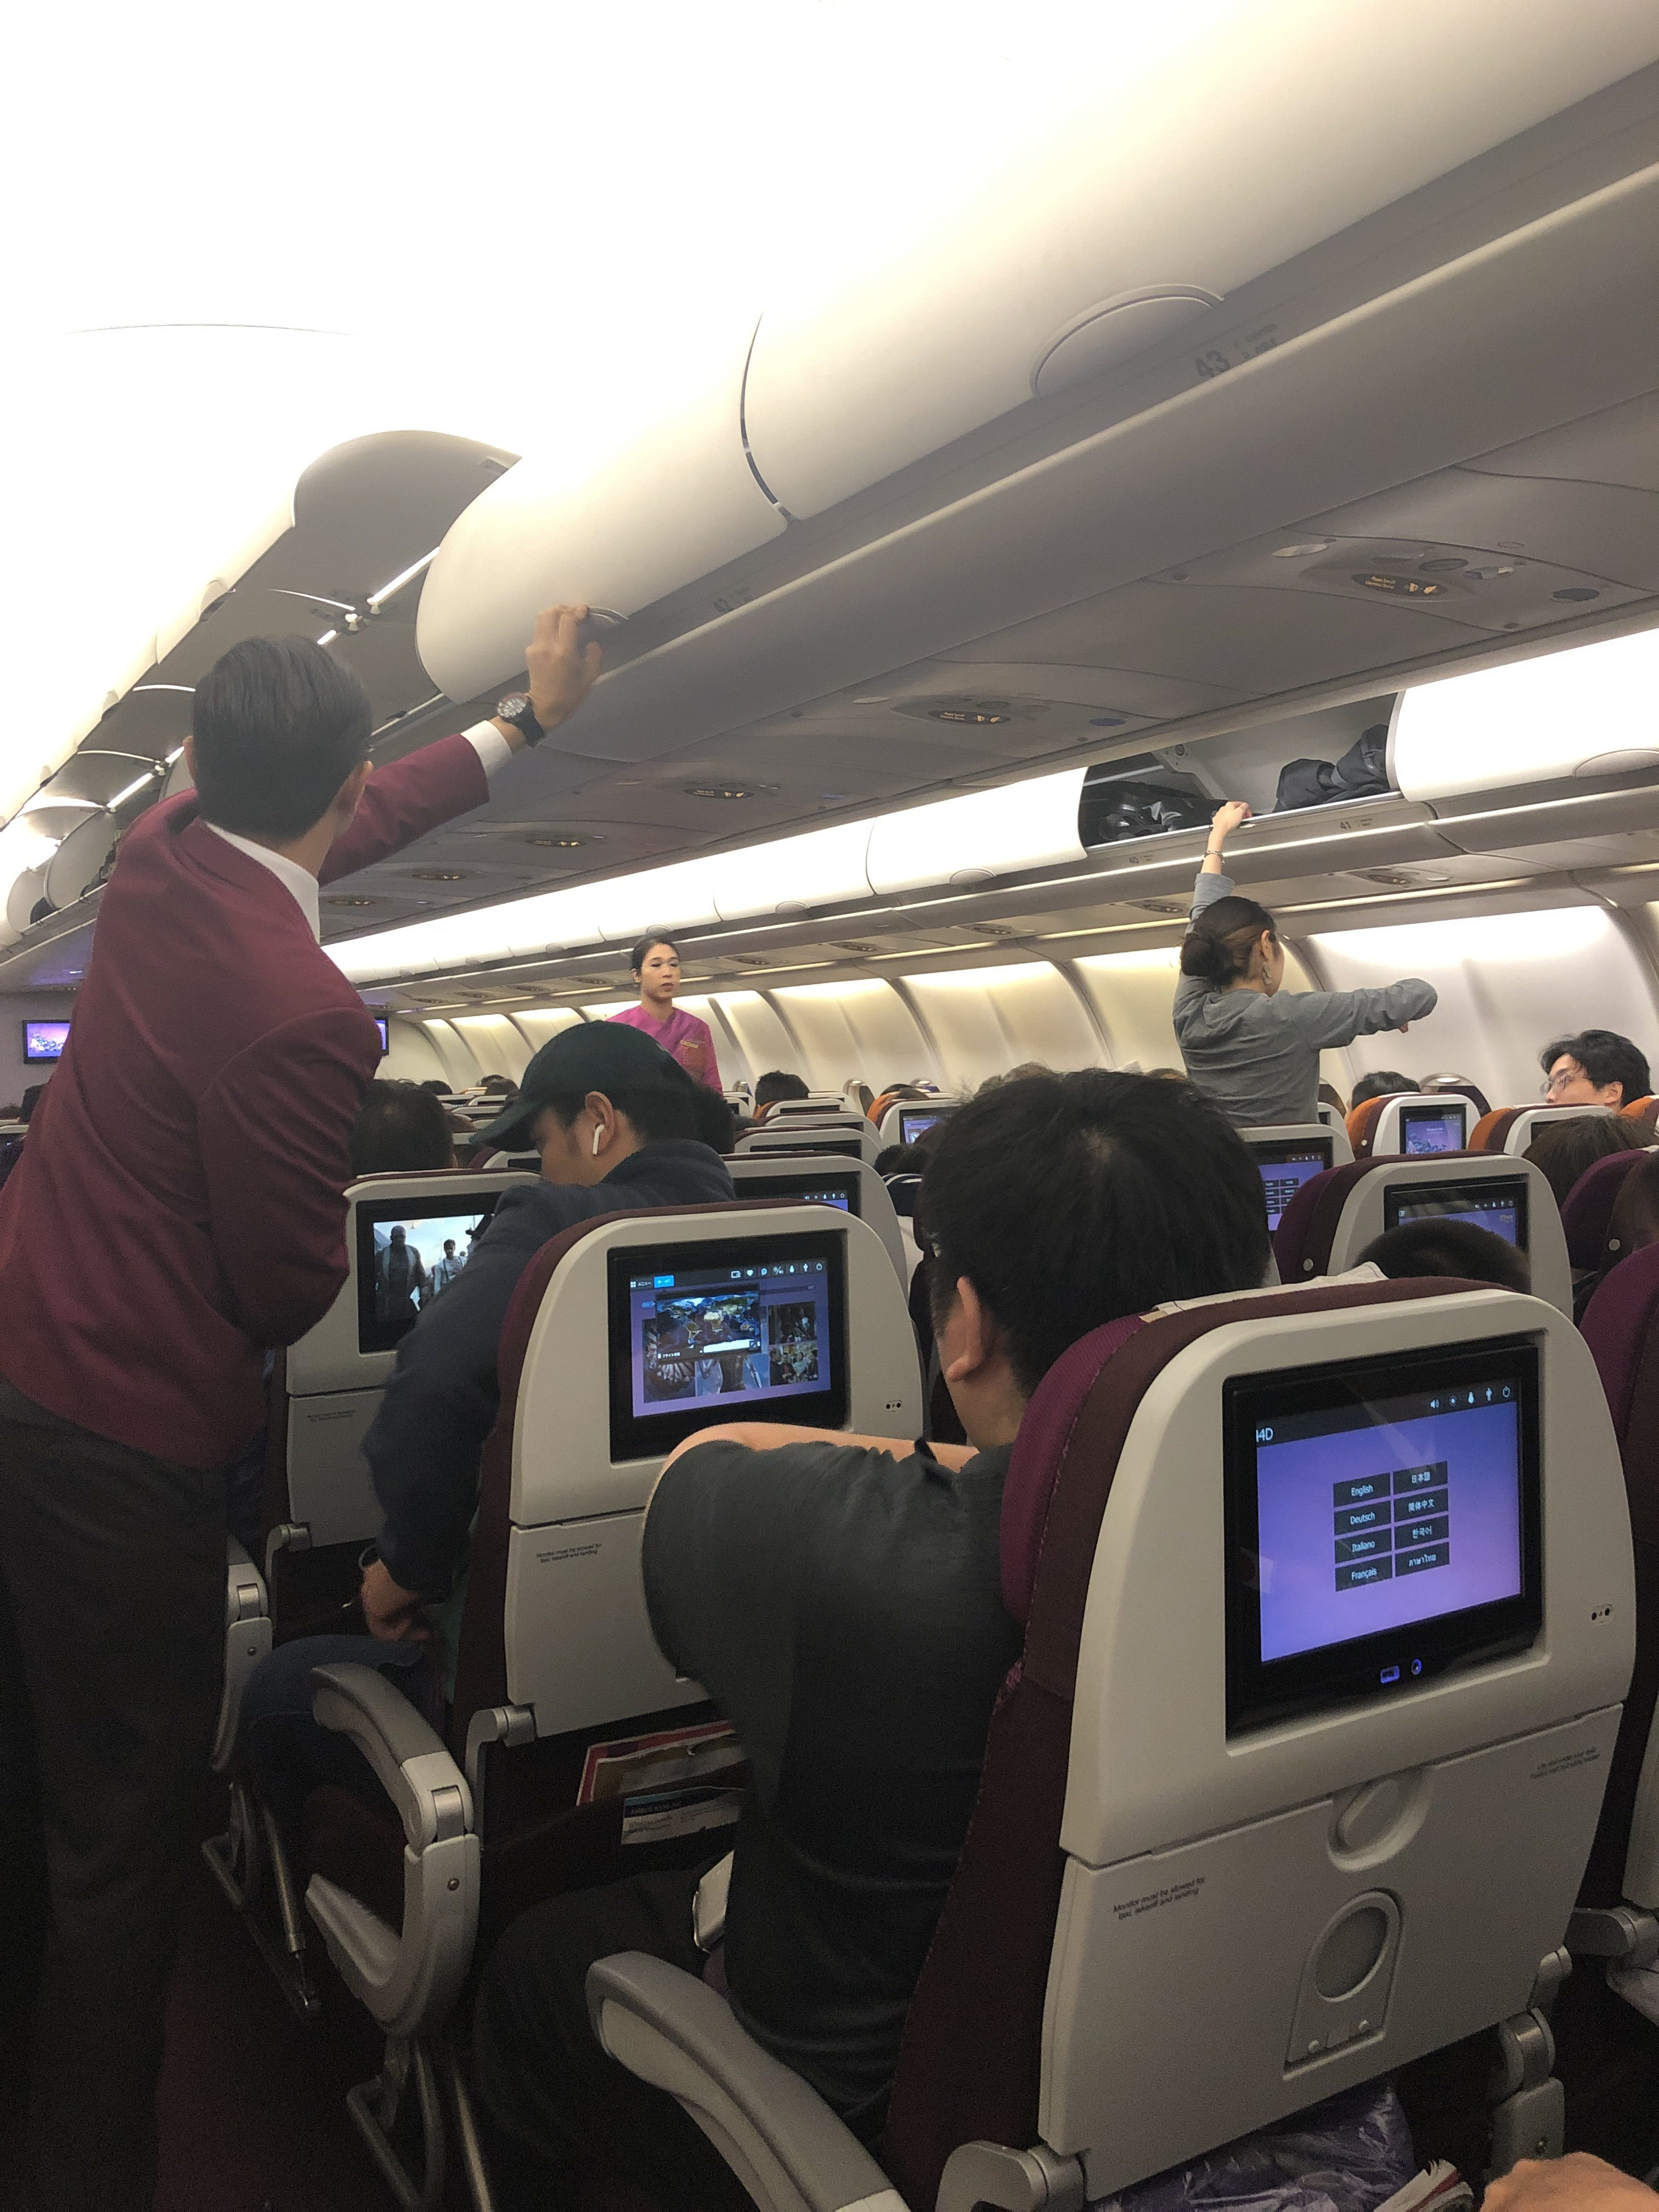 Thai Airways Customer Reviews | SKYTRAX